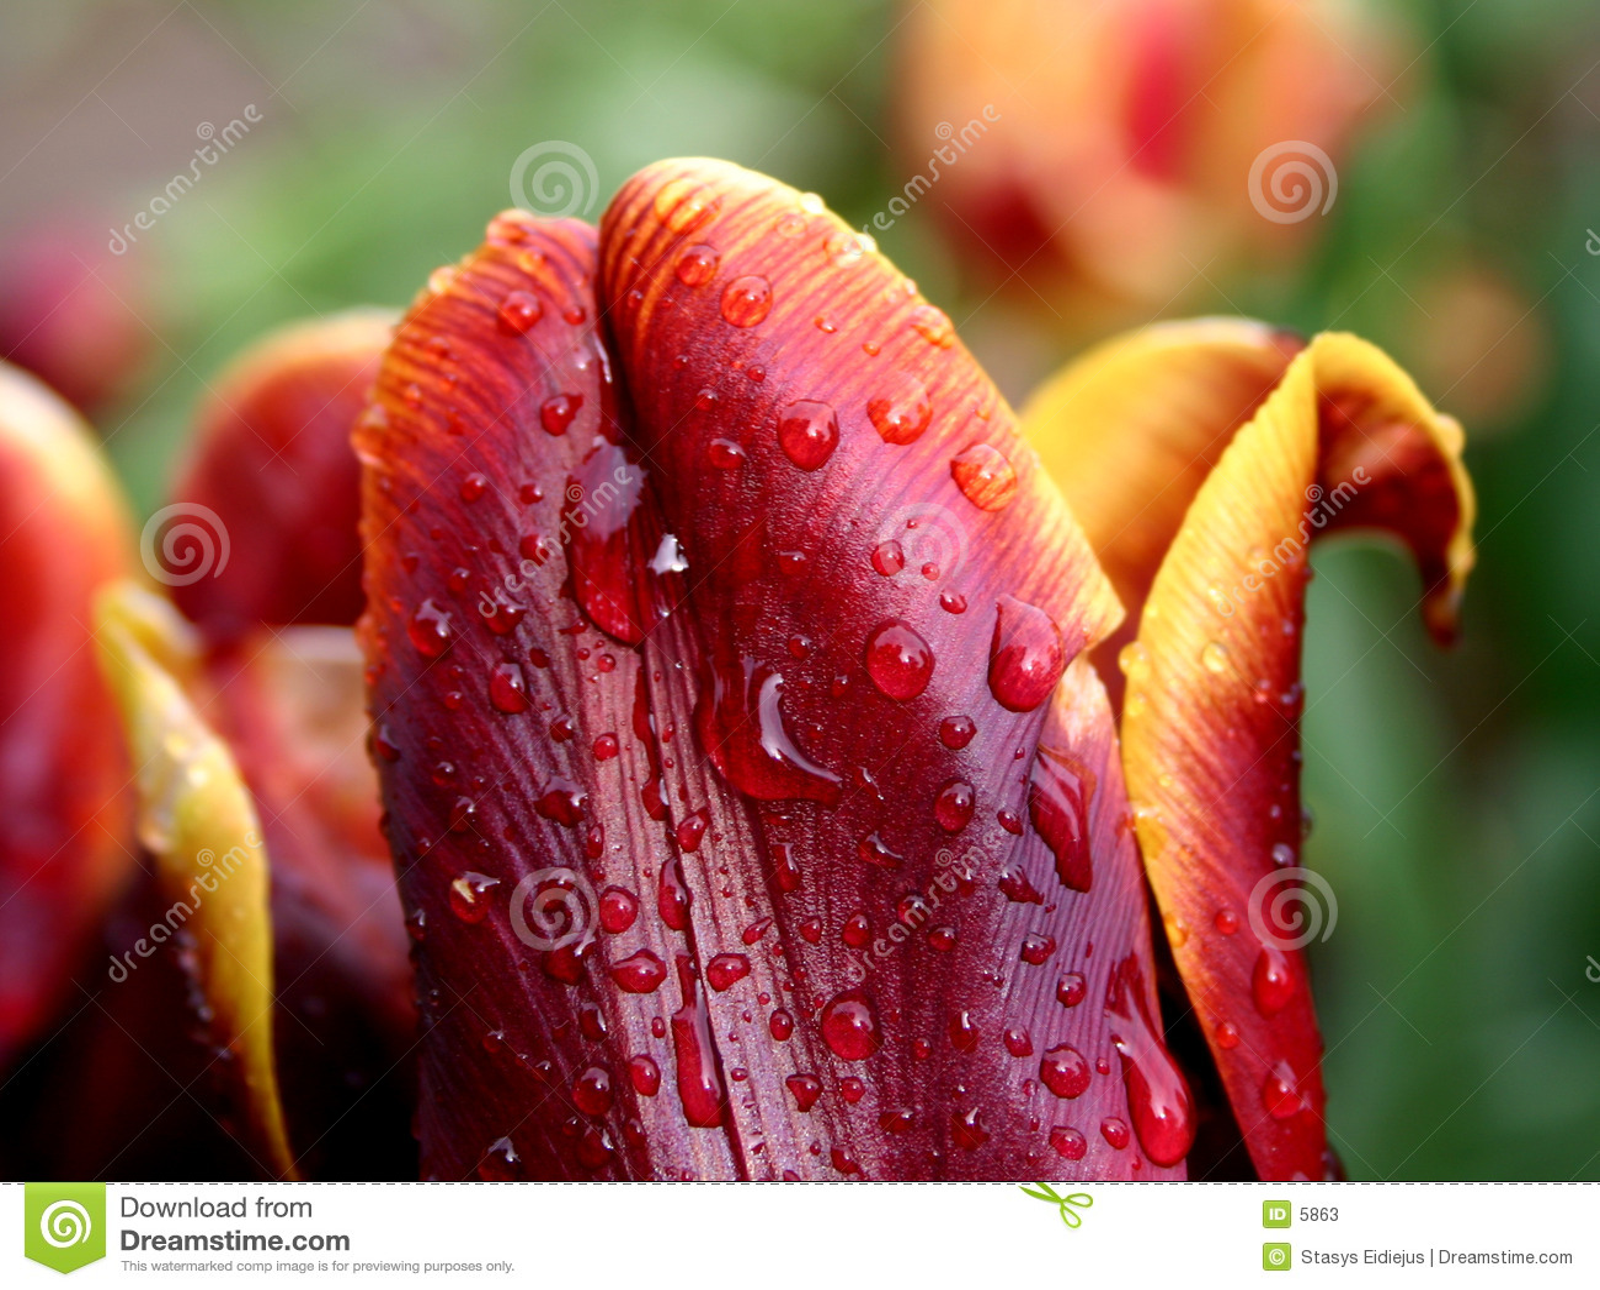 Yellow-red tulip in the rain